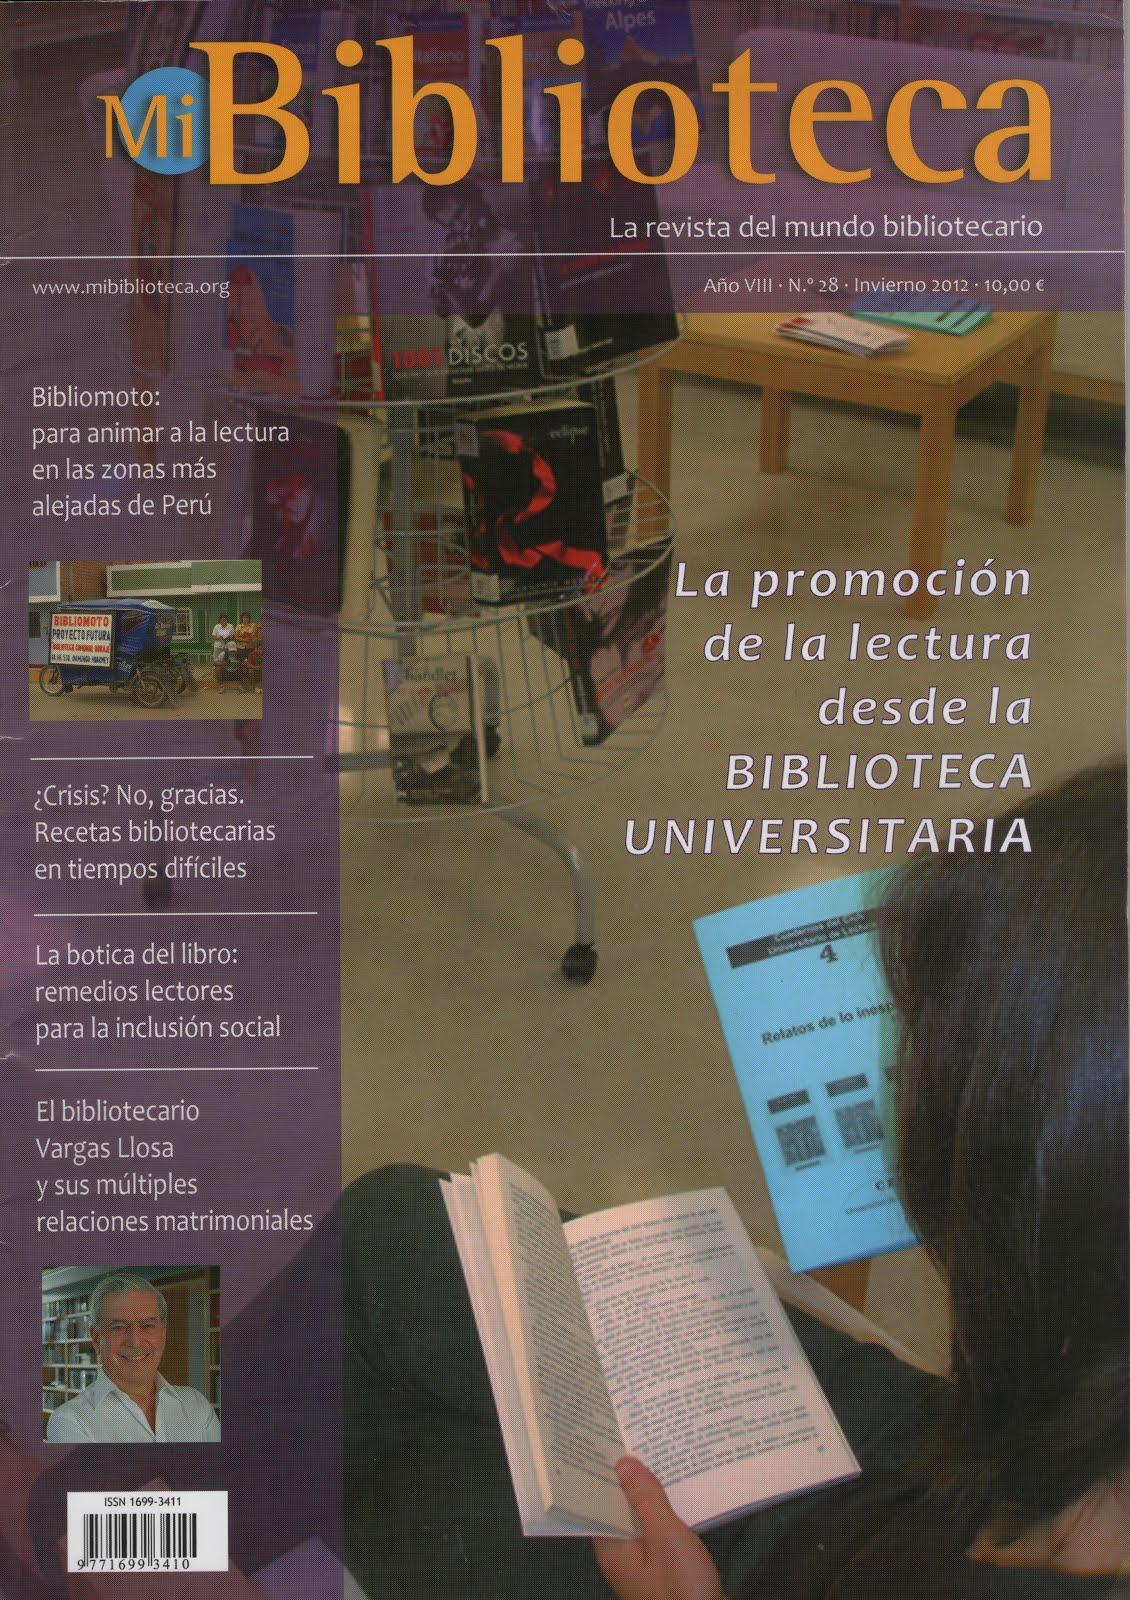 REVISTA MI BIBLIOTECA - MALAGA - ESPAÑA